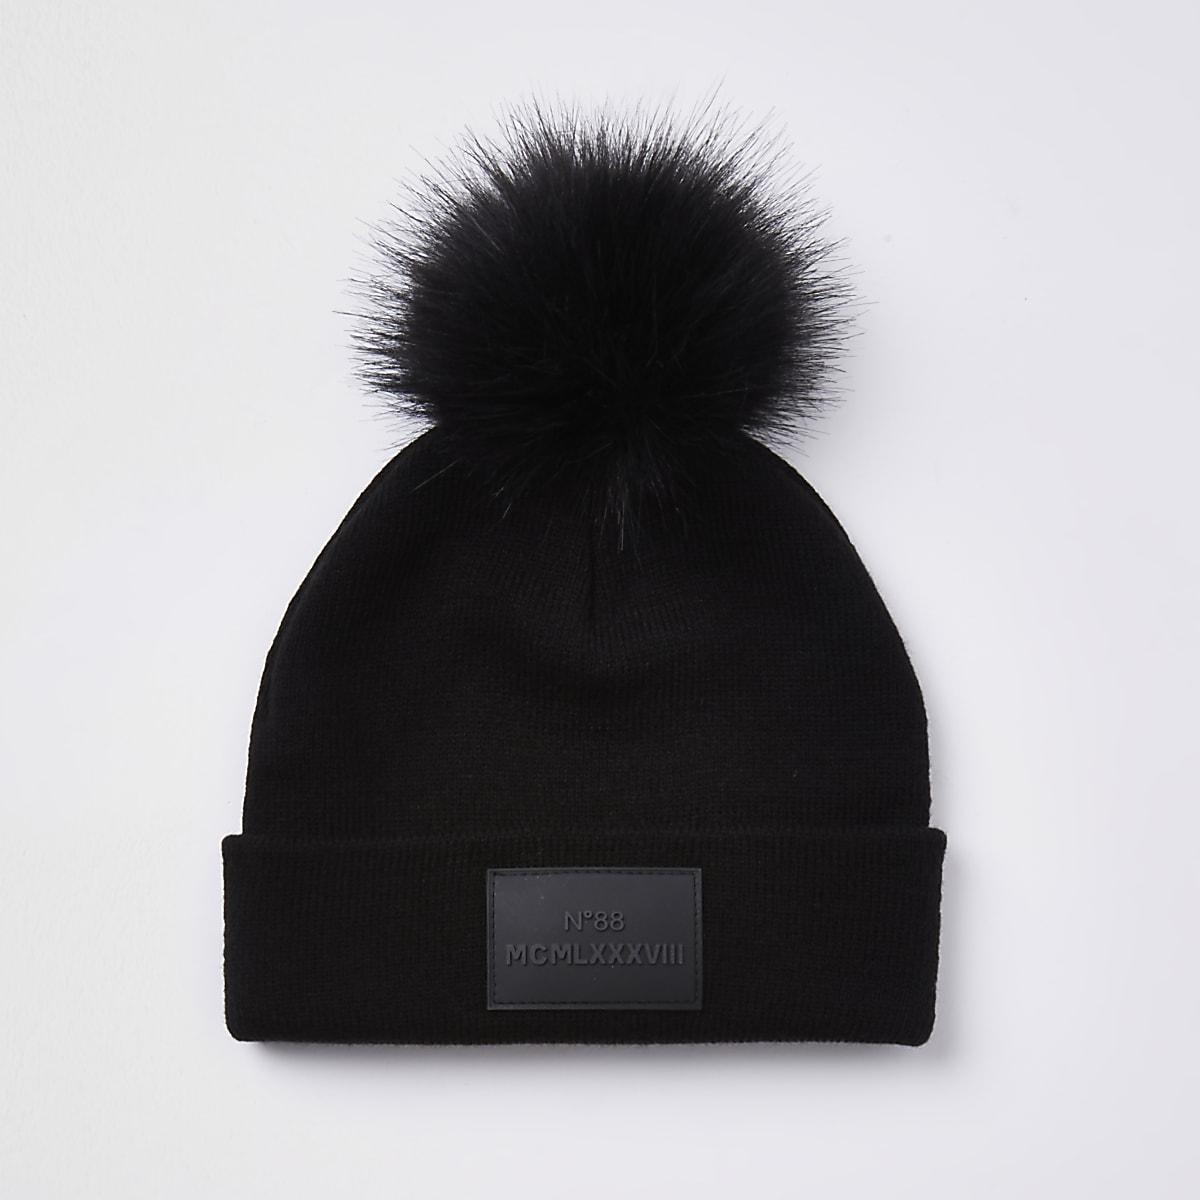 b54538fb96f Boys black faux fur pom pom beanie hat - Hats - Accessories - boys